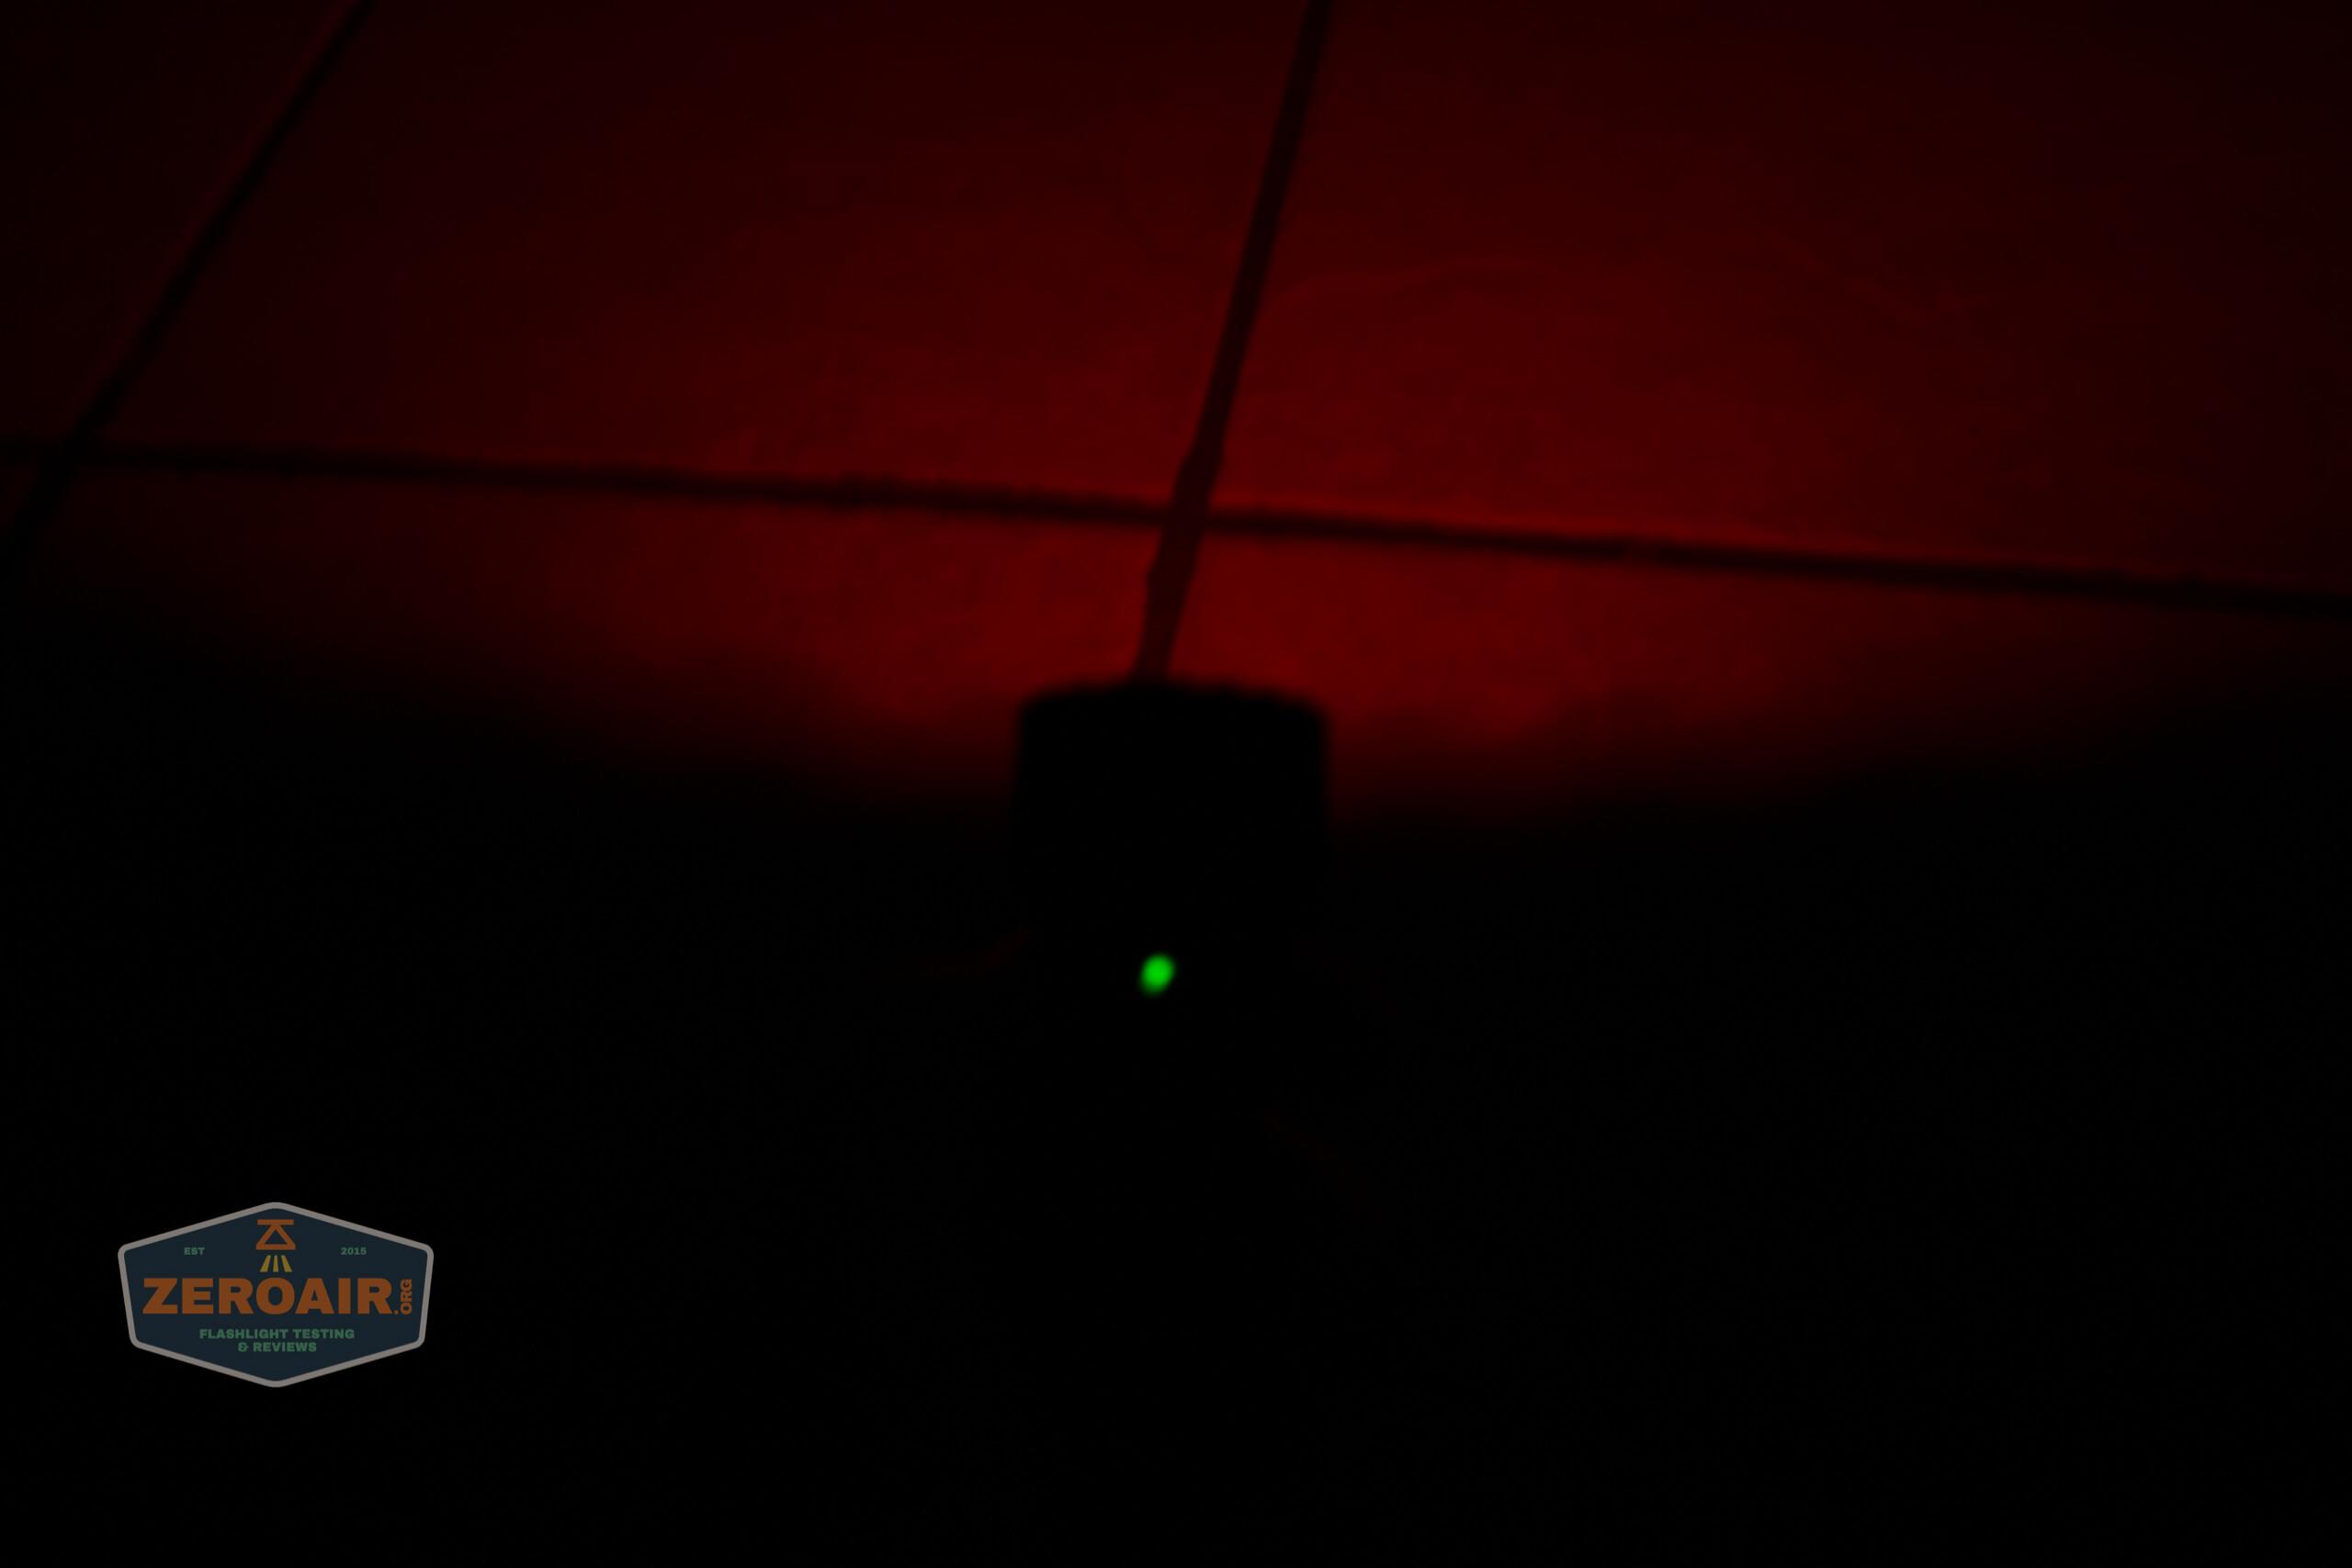 olight freyr rgb flashlight side e-switch indicating green